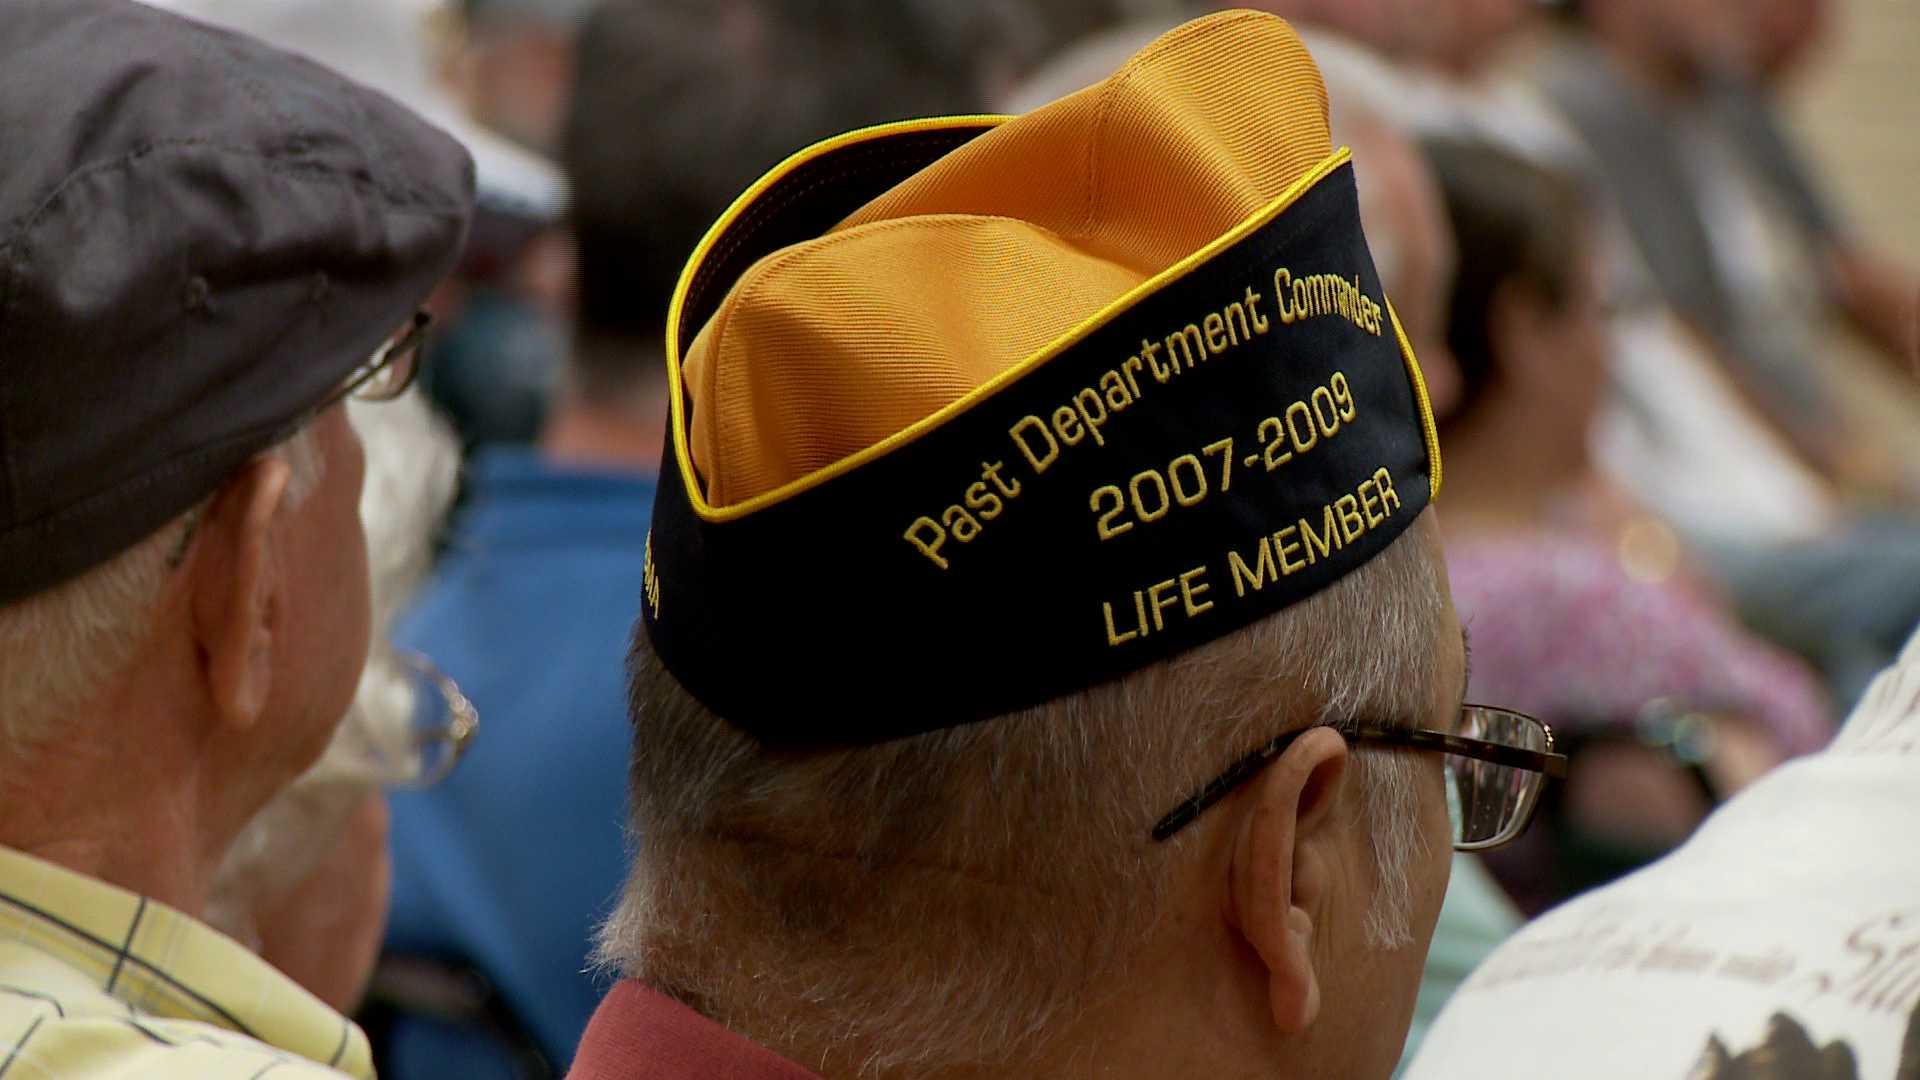 Veteran with hat